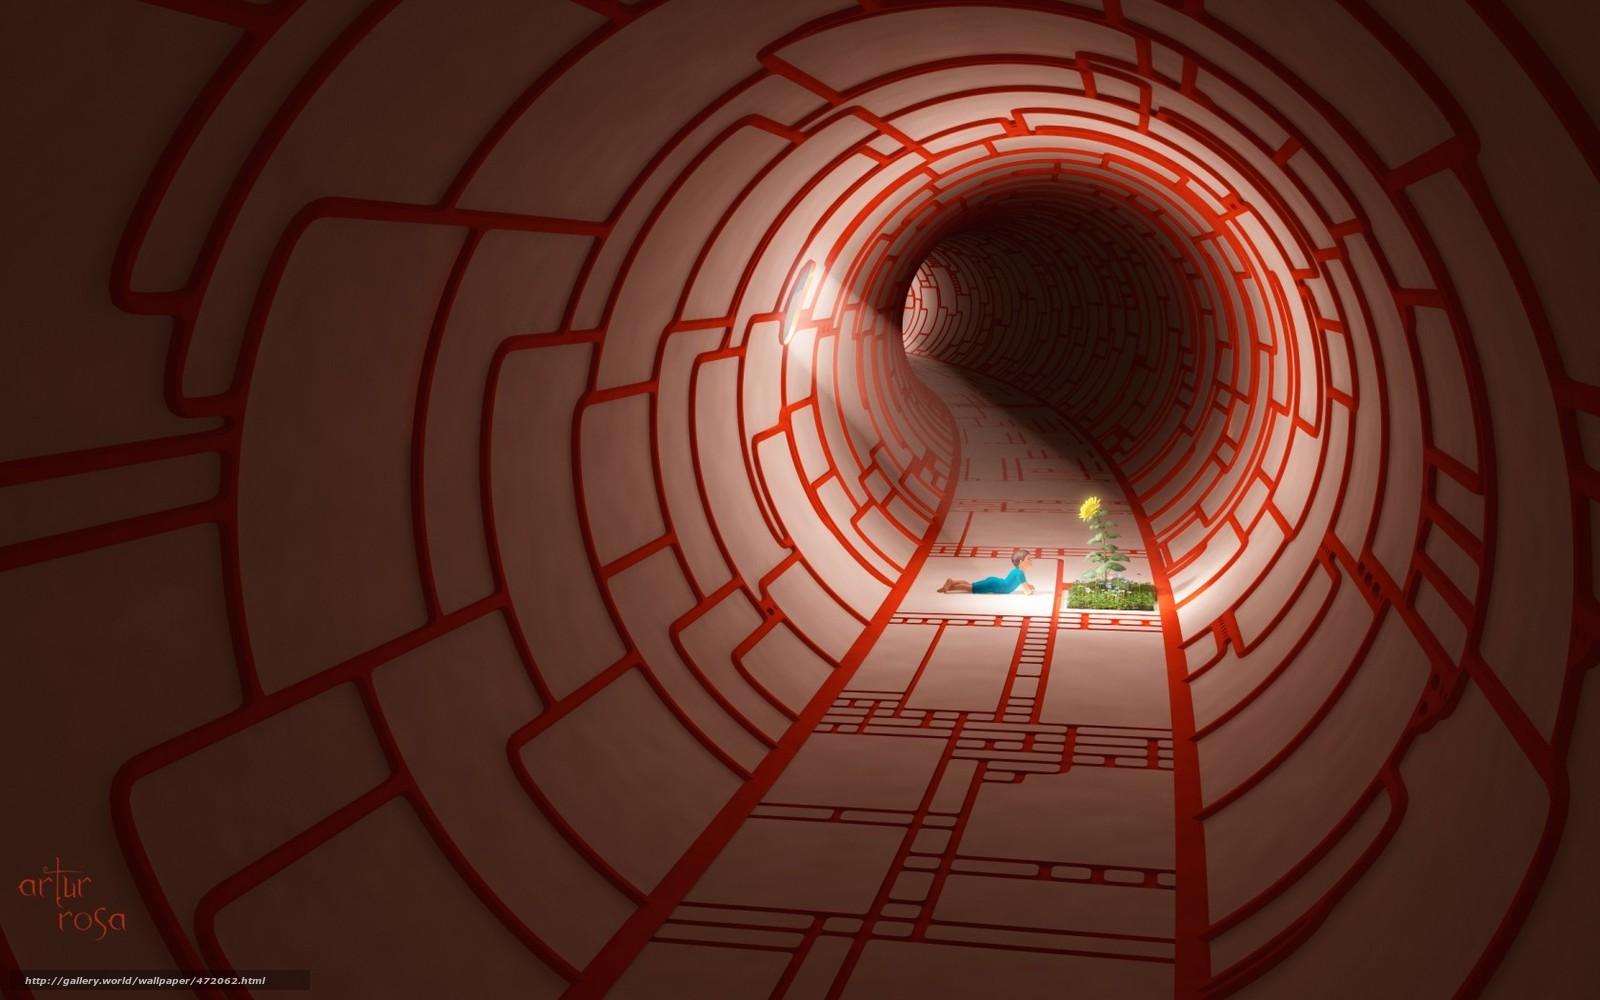 Download wallpaper corridor round child sunflower free desktop wallpaper in the resolution - Wallpaper corridor ...